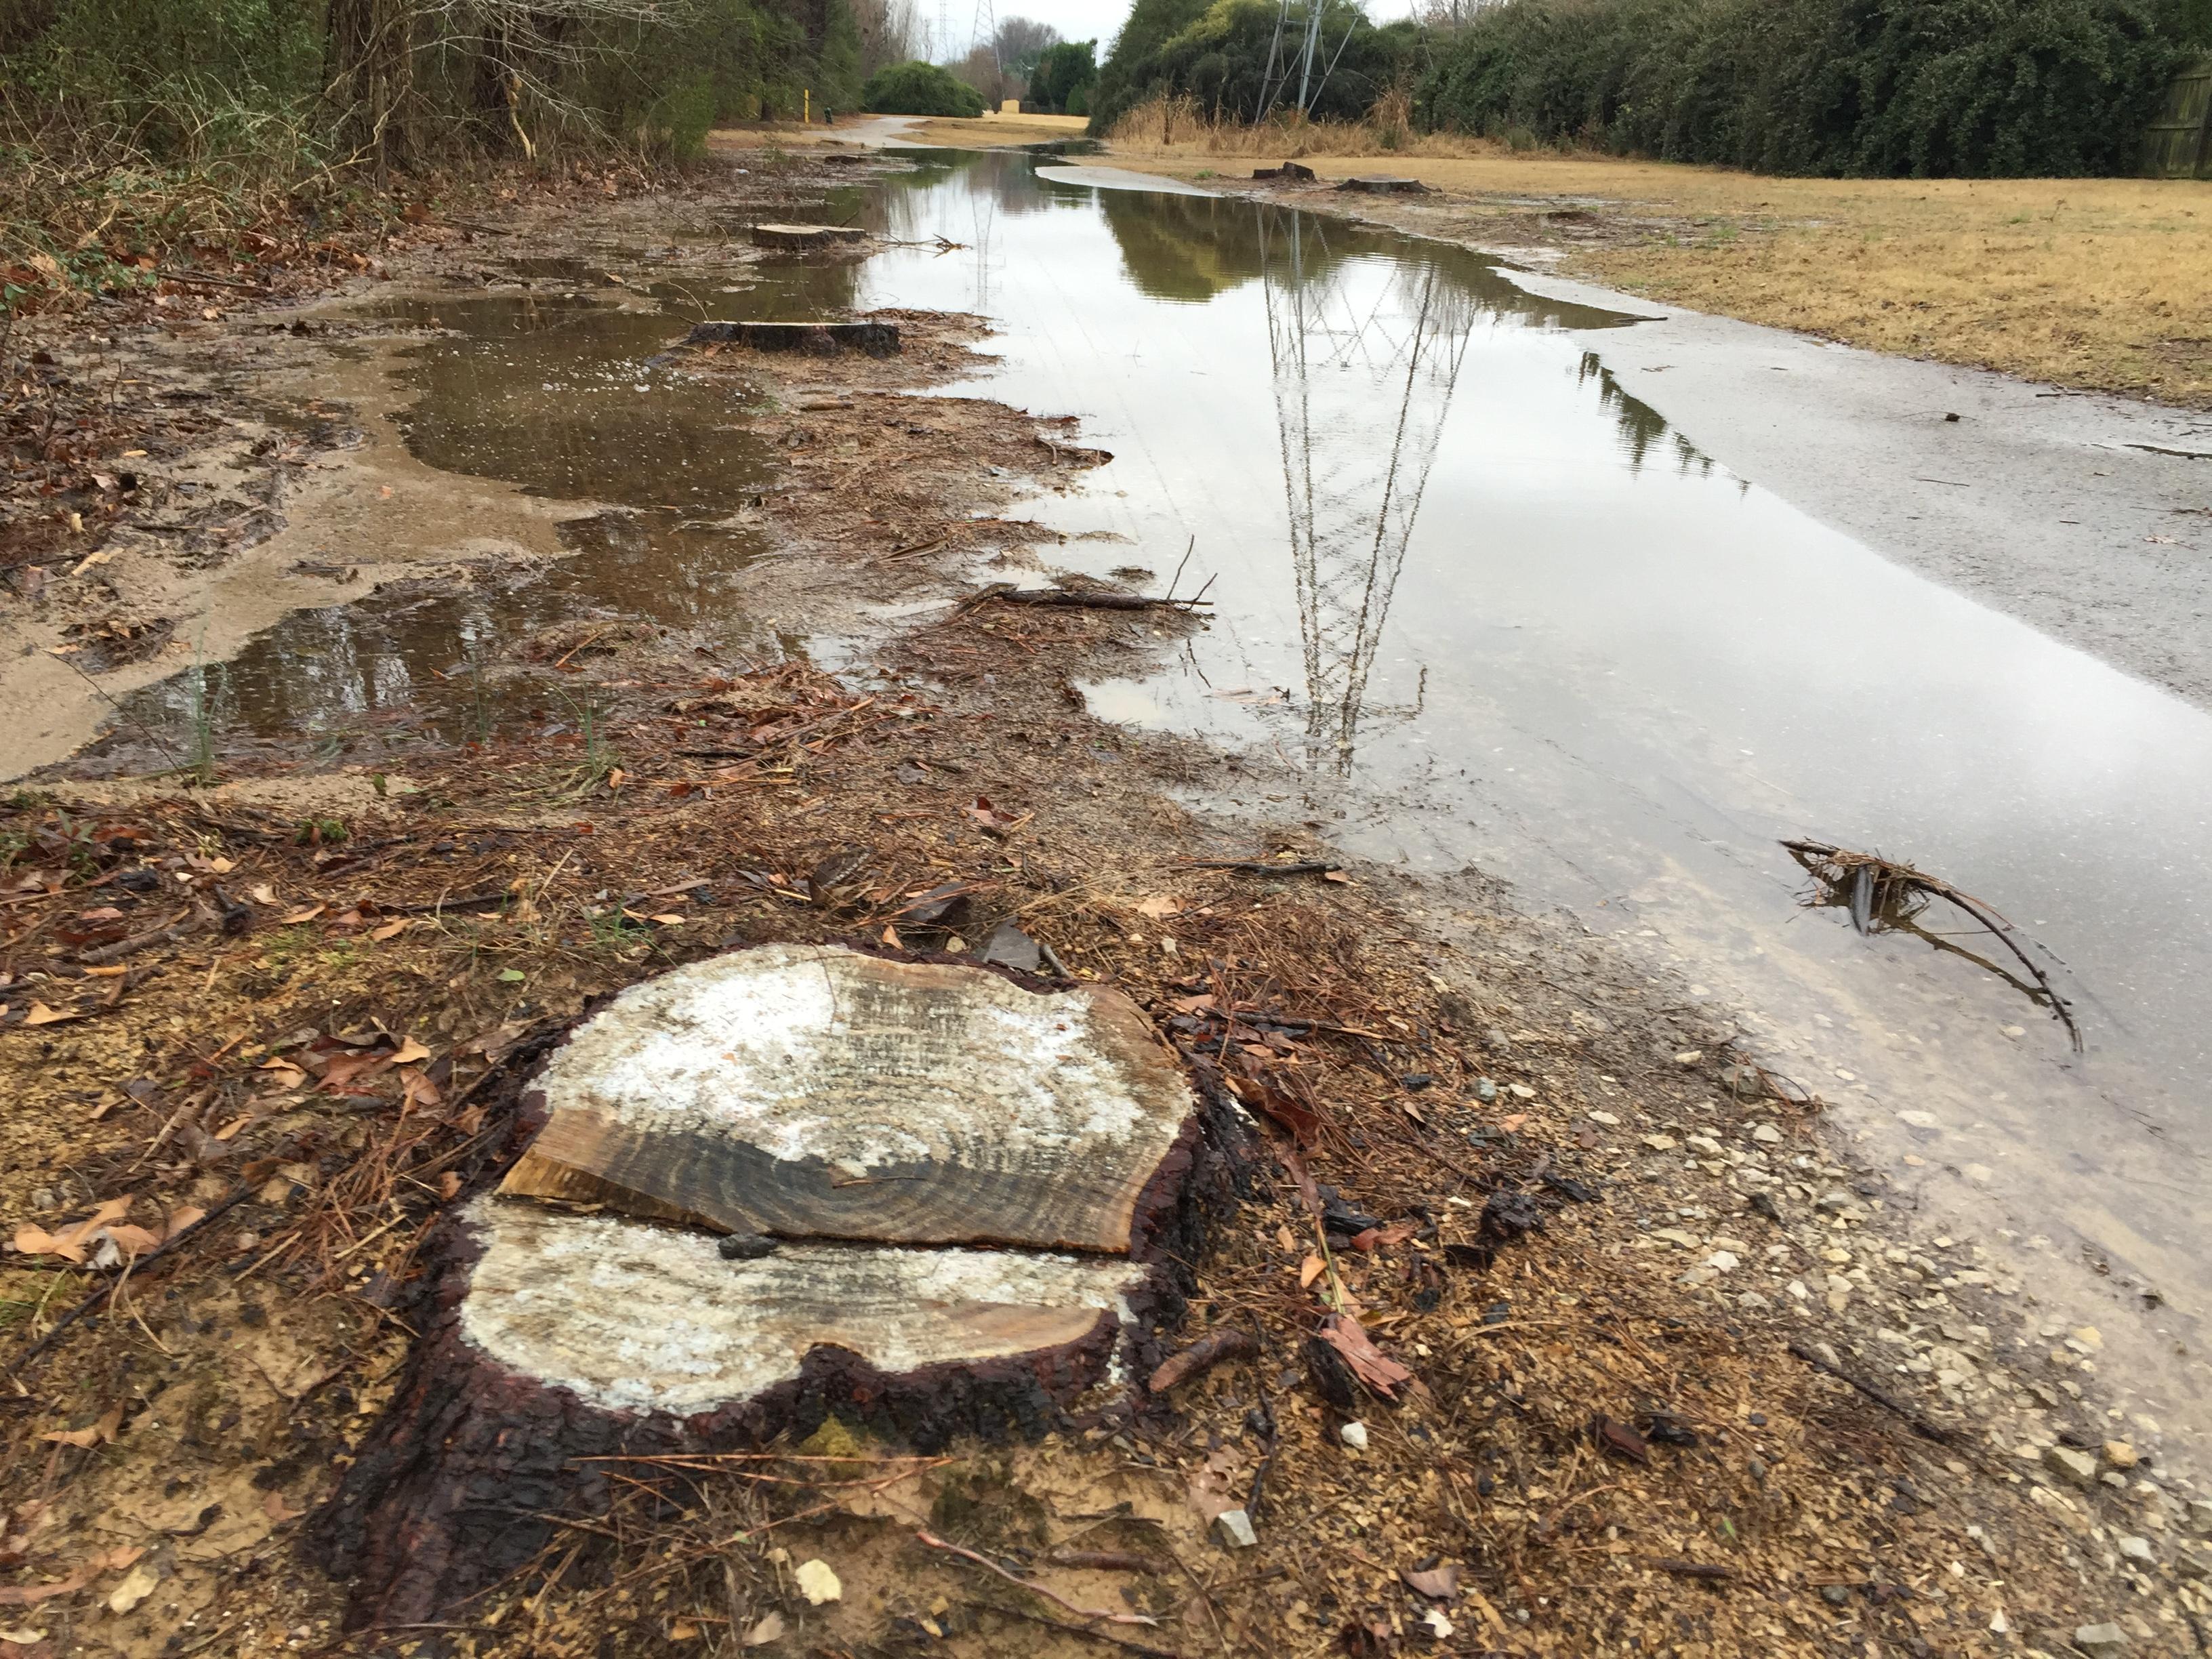 germantown tn running trail flood